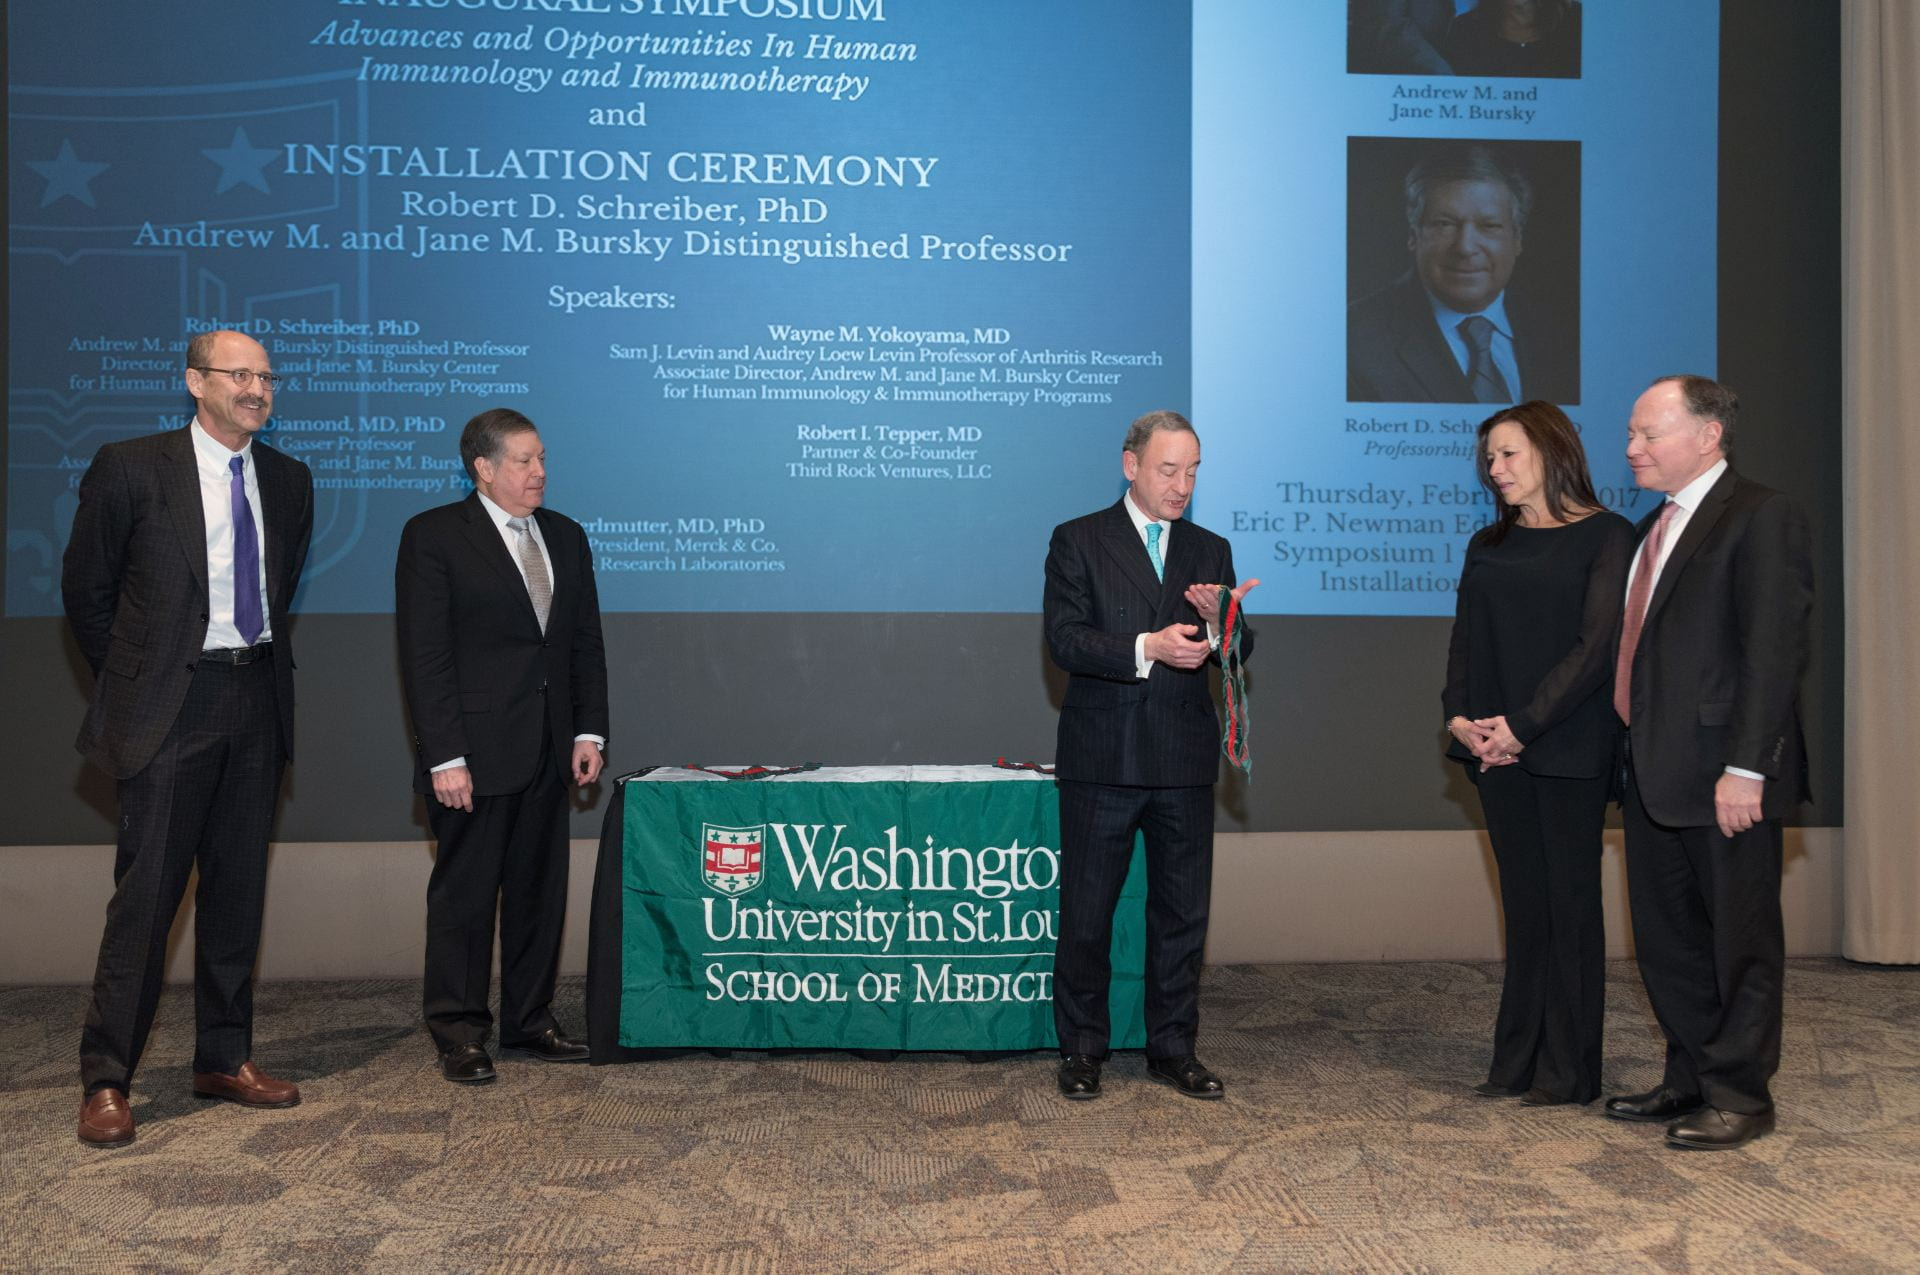 Dean Perlmutter, Bob Schreiber, Chancellor Wrighton, Jane Bursky, and Andy Bursky